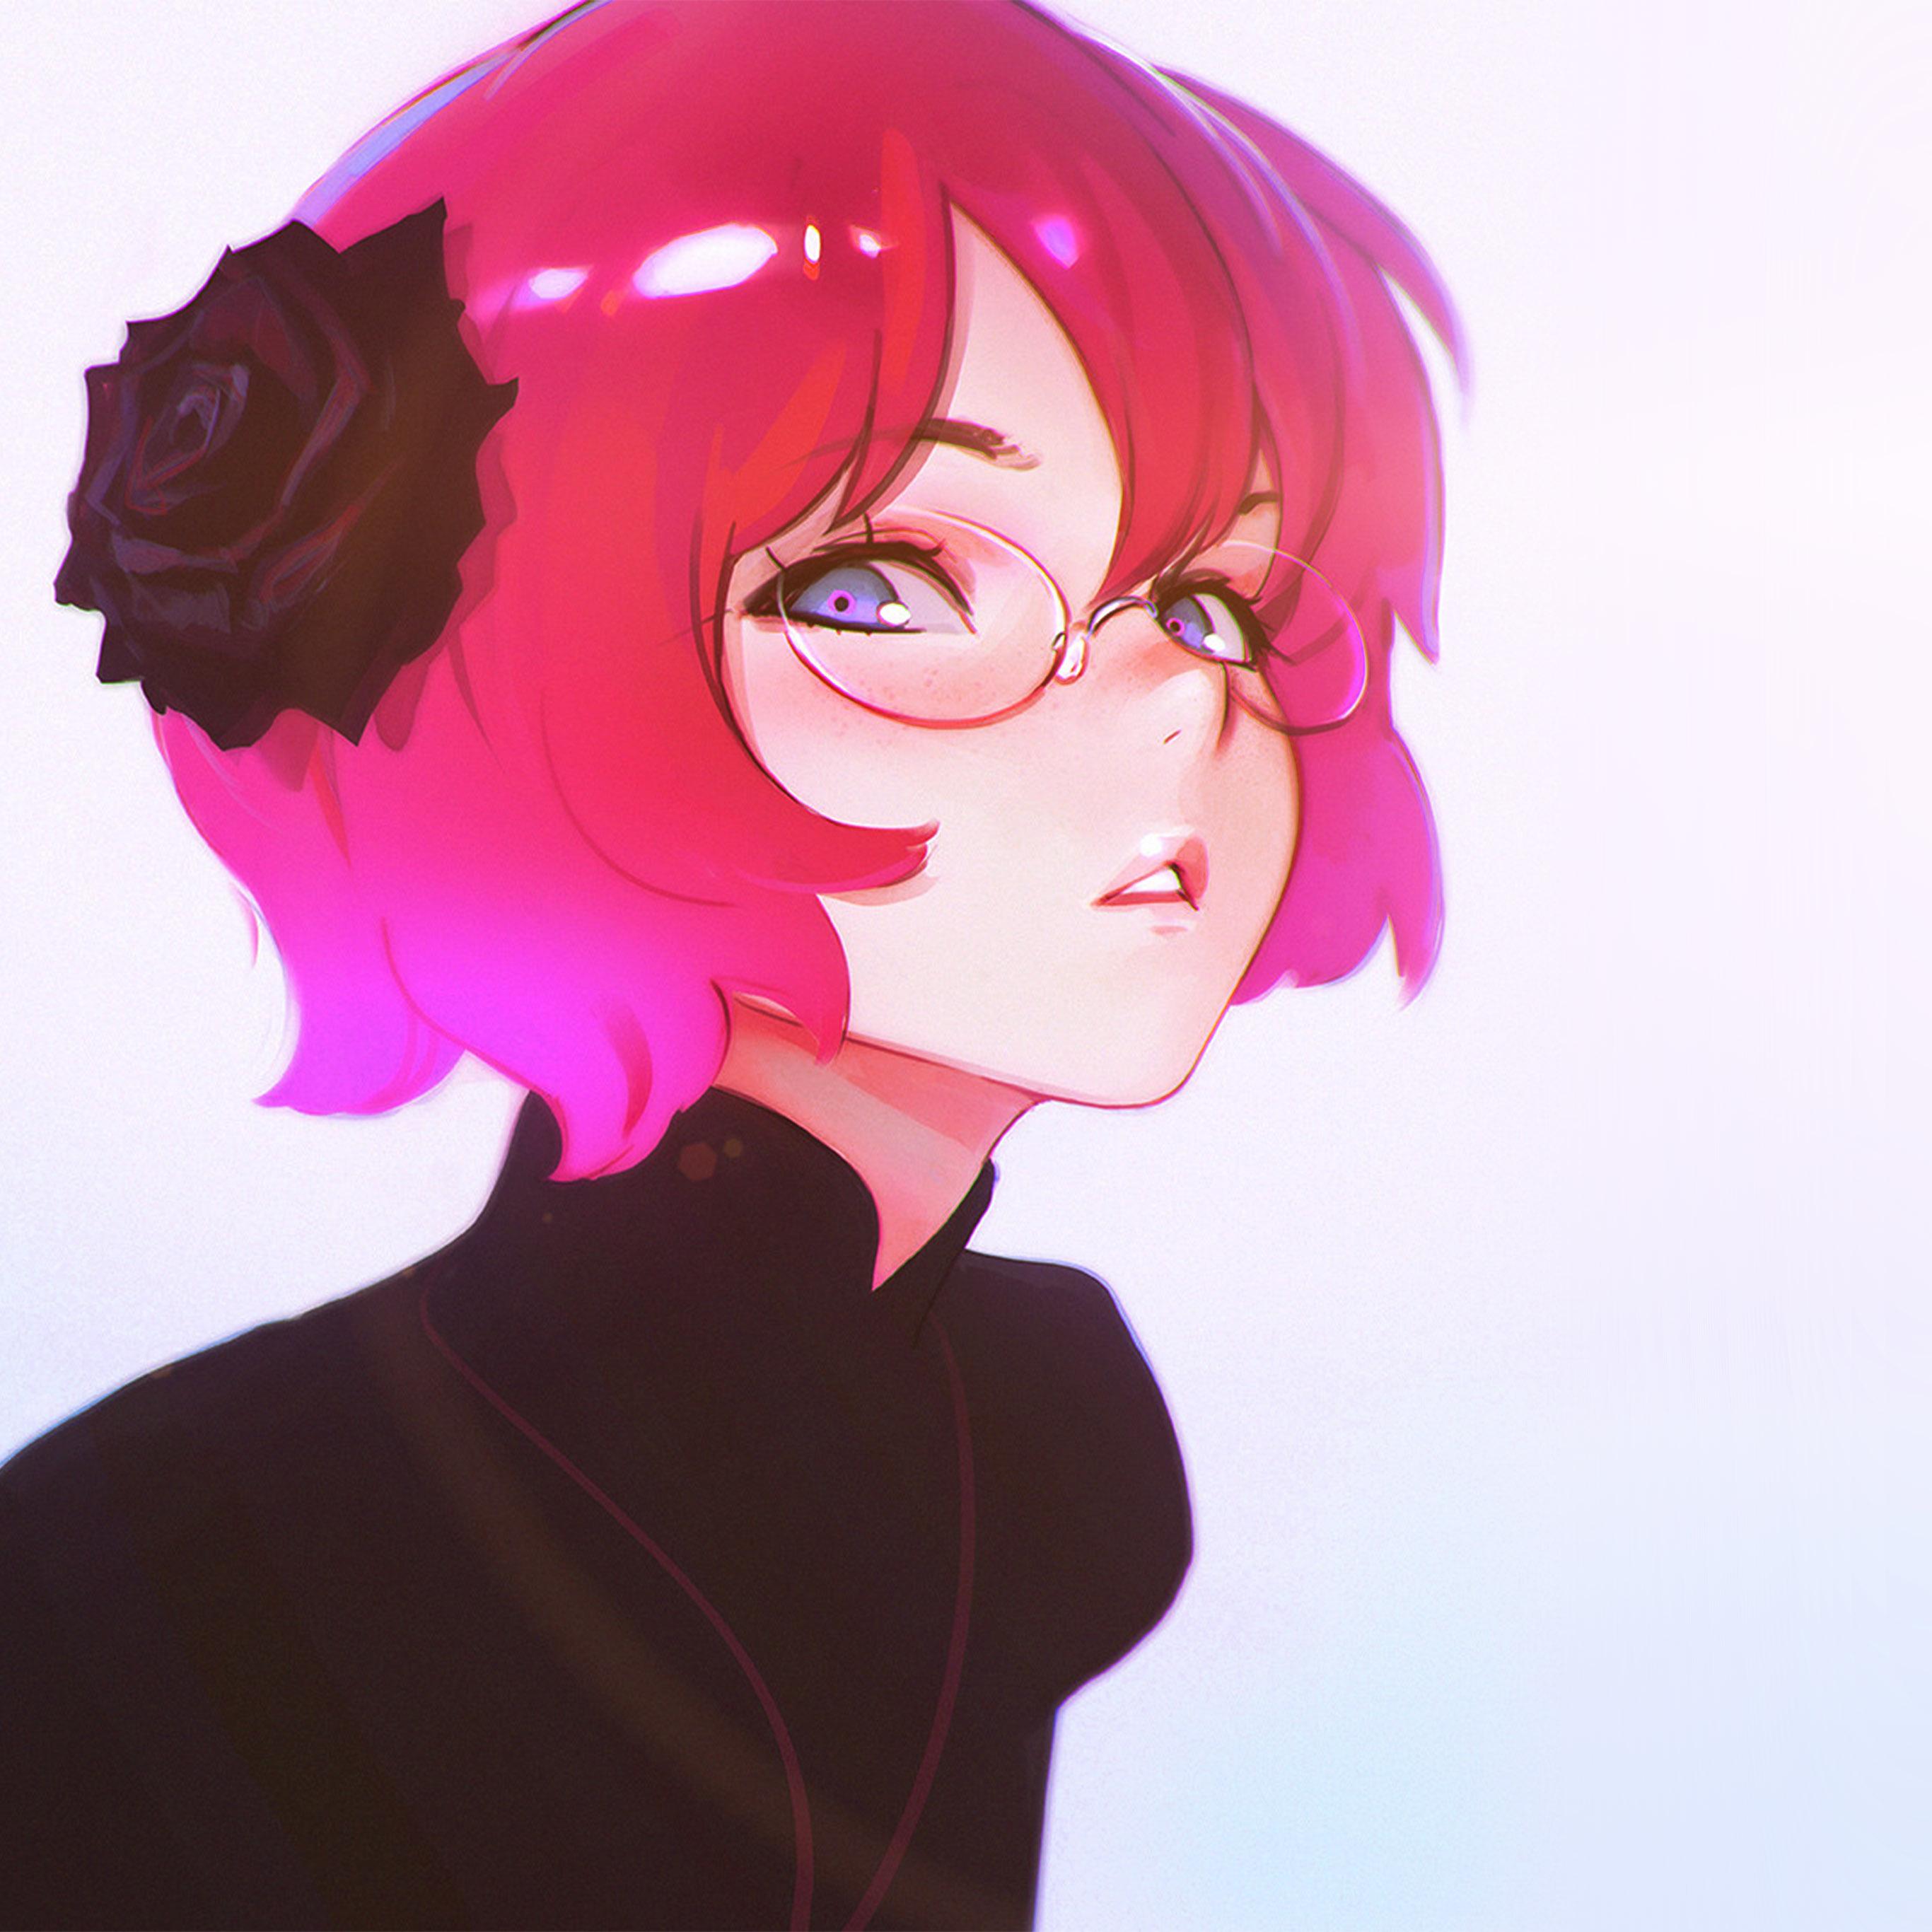 av00-ilya-kuvshinov-girl-cute-pink-illustration-art-flare ...